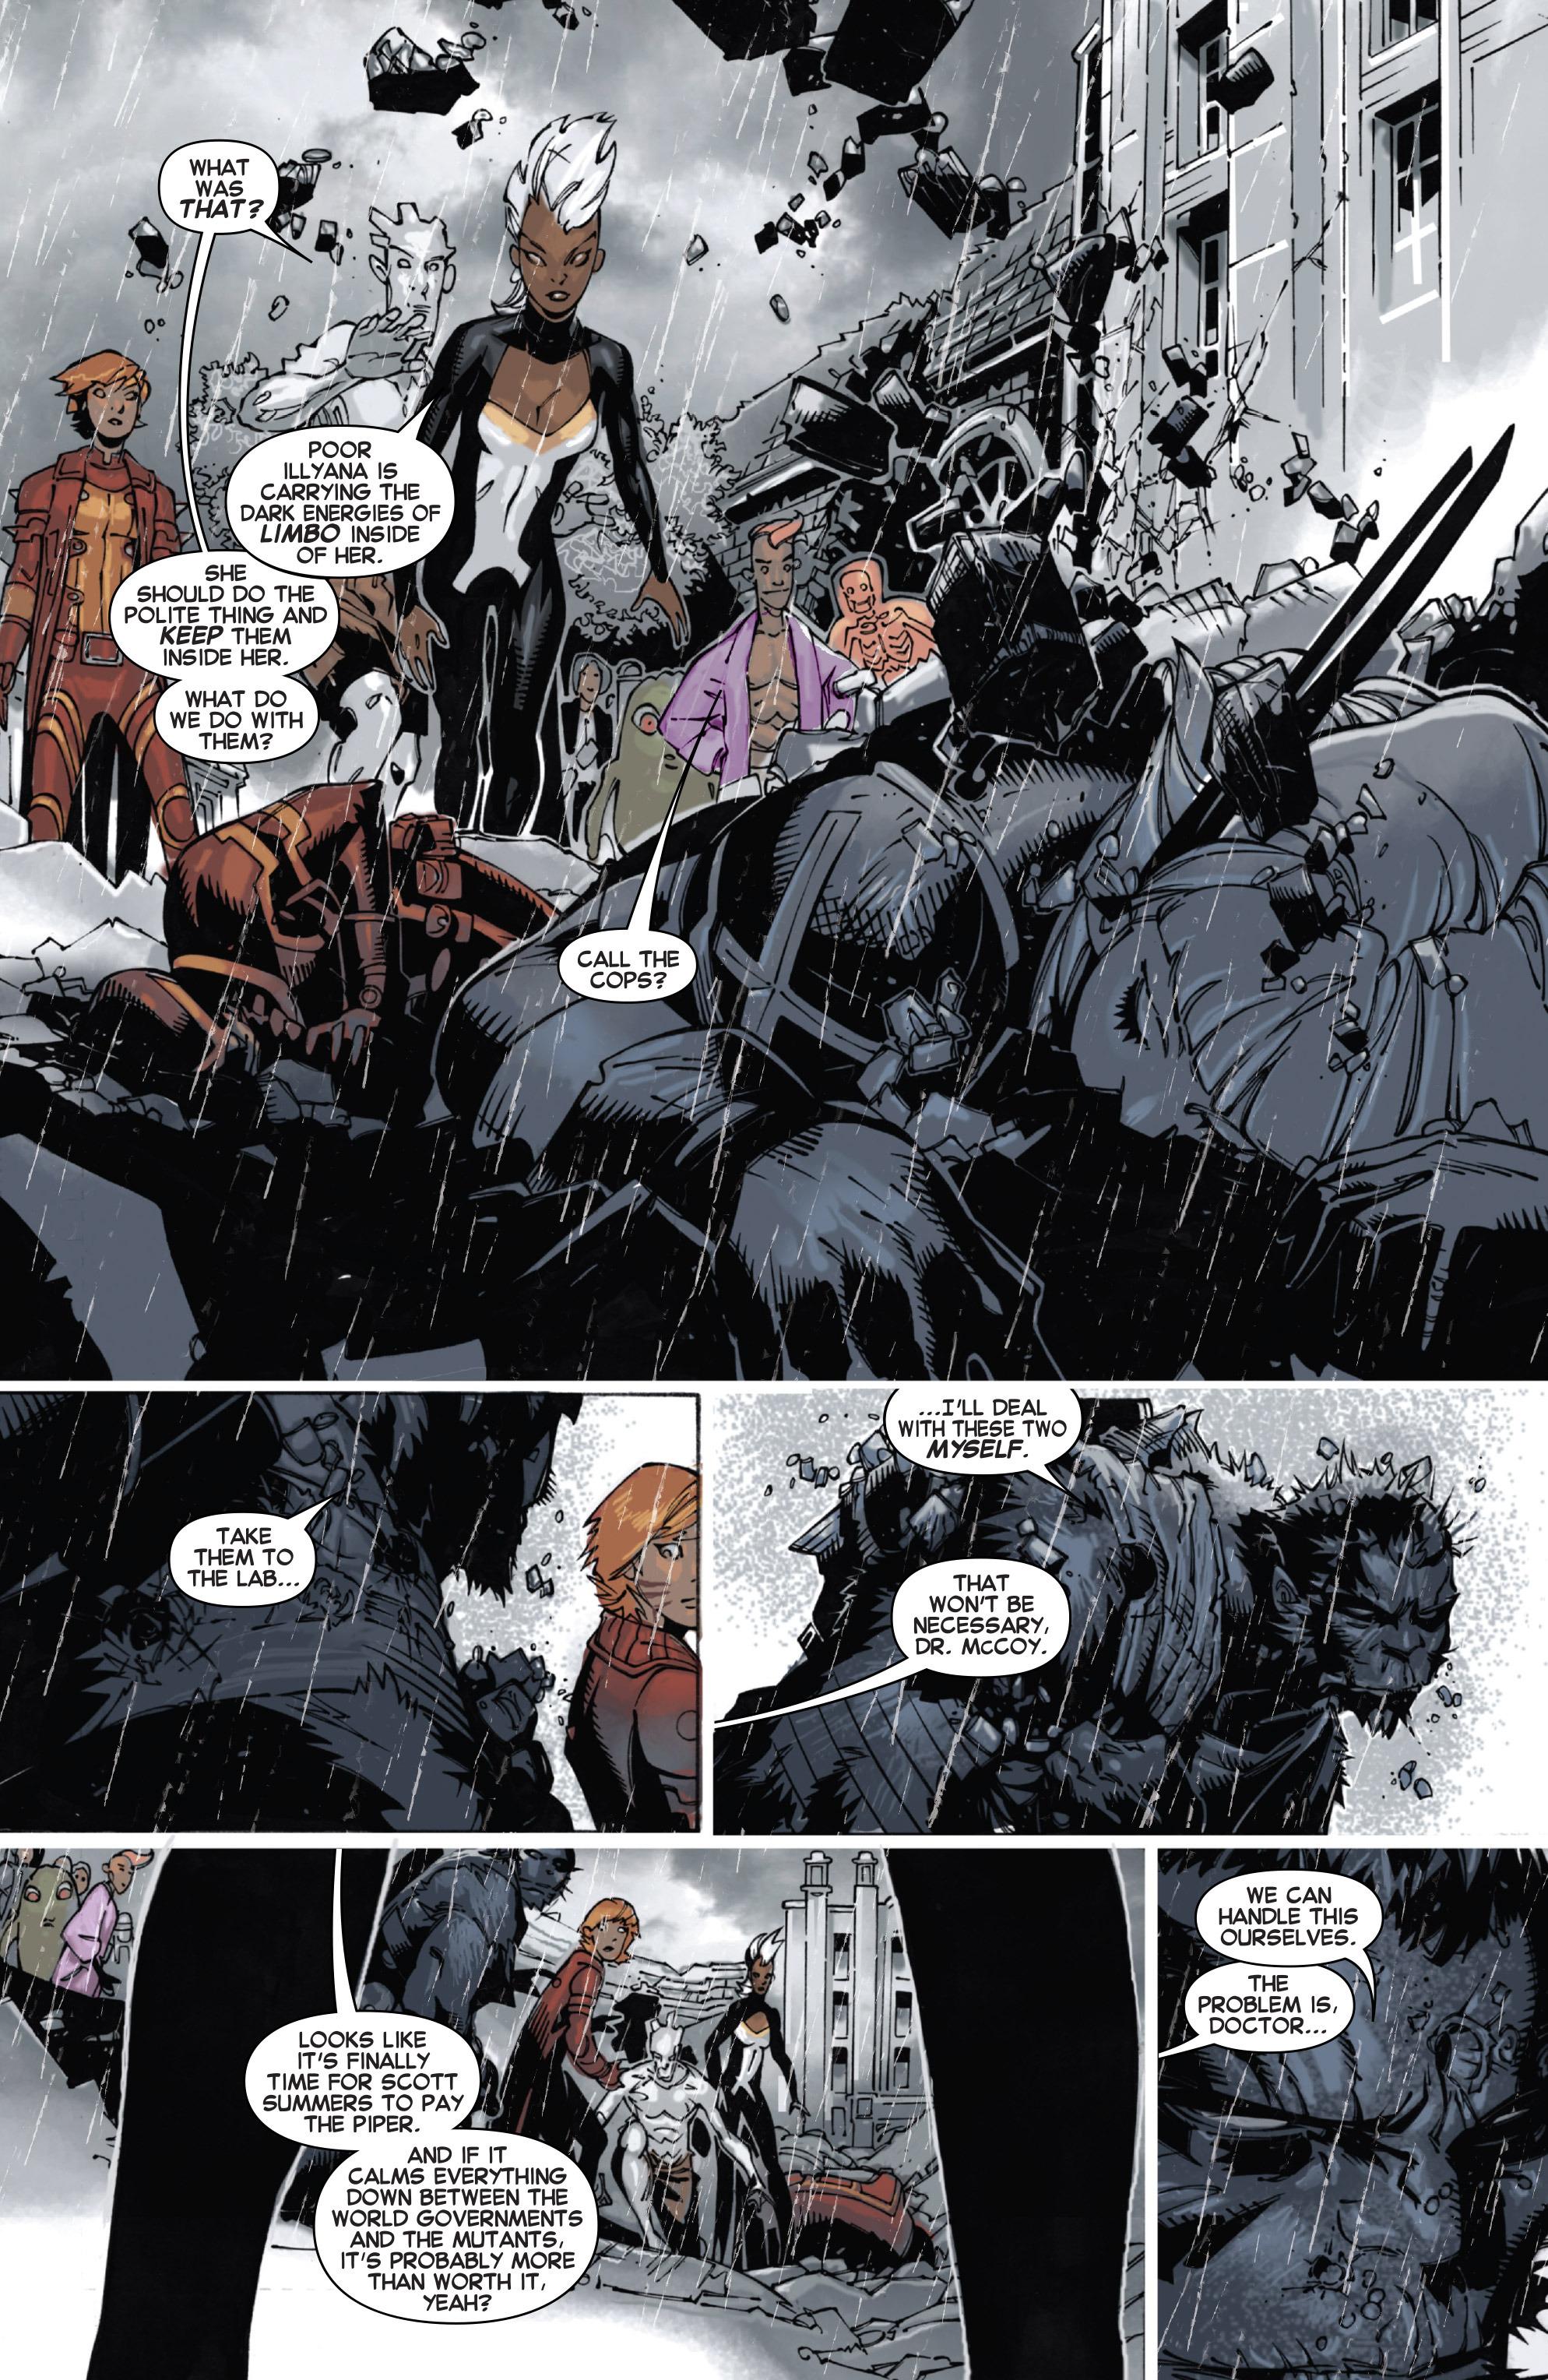 Read online Uncanny X-Men (2013) comic -  Issue # _TPB 4 - vs. S.H.I.E.L.D - 46